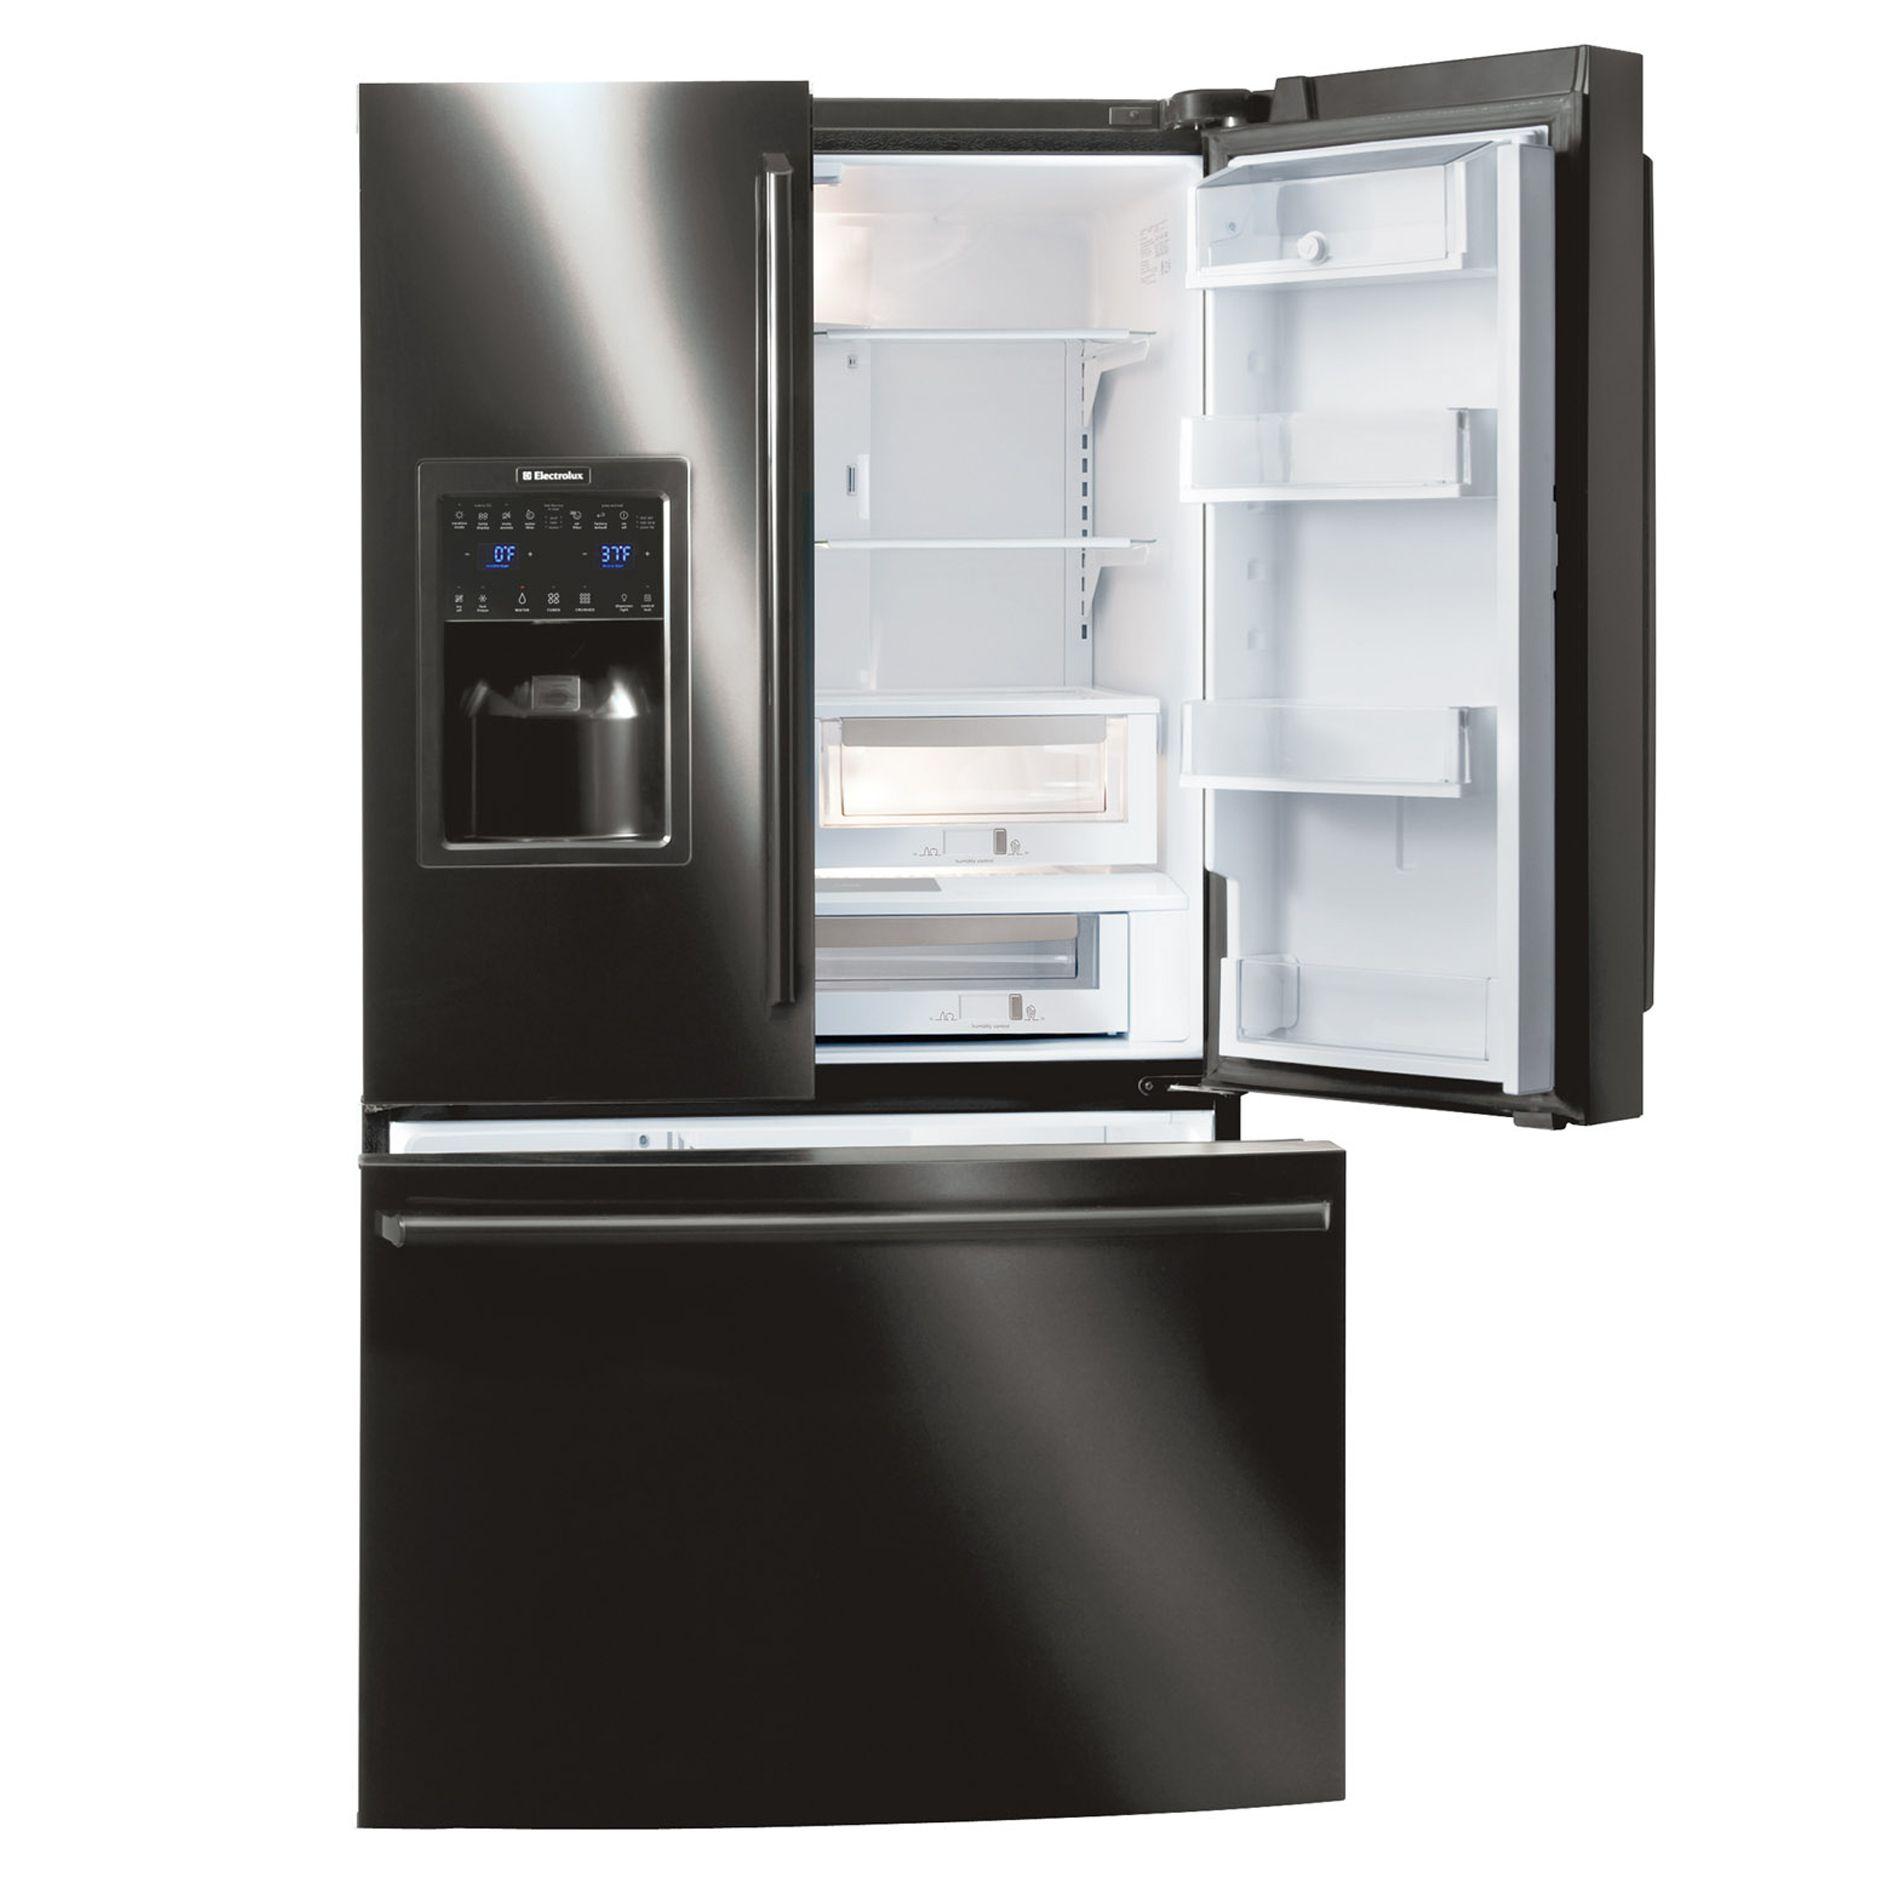 Electrolux 22.6 cu. ft. French-Door Bottom Freezer Refrigerator  (EI23BC56I)